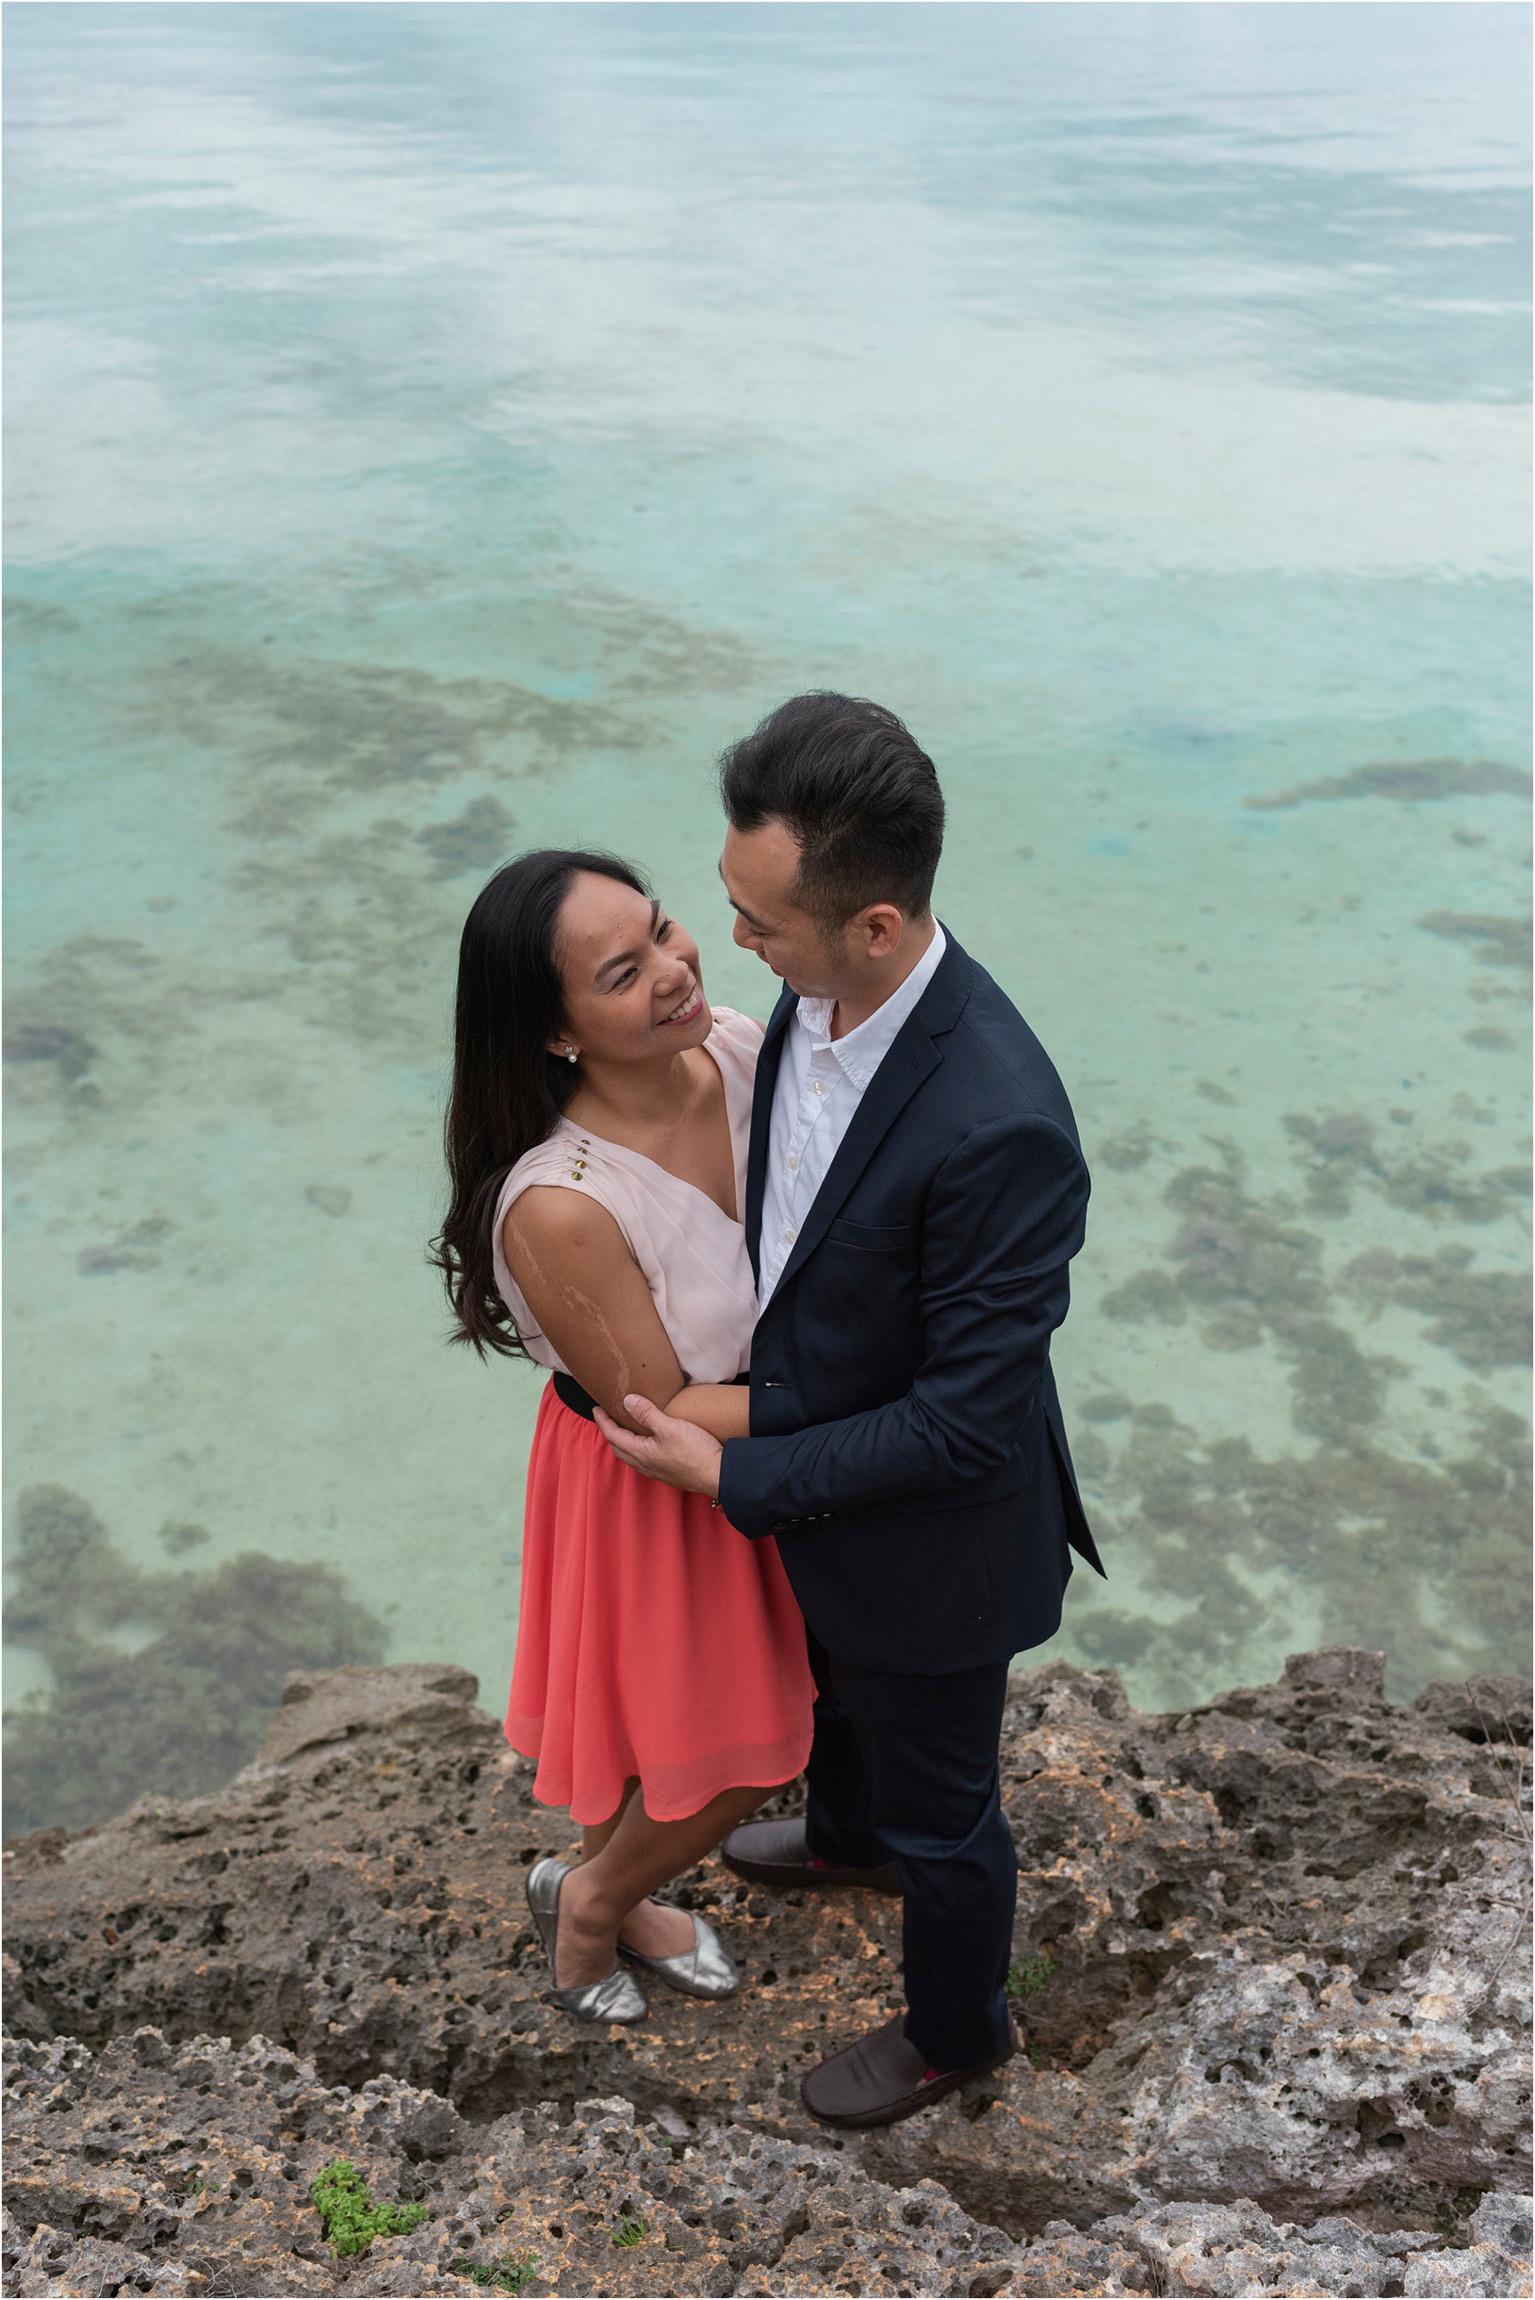 ©FianderFoto_Bermuda Engagement_Photographer_Owen_Chanson_023.jpg